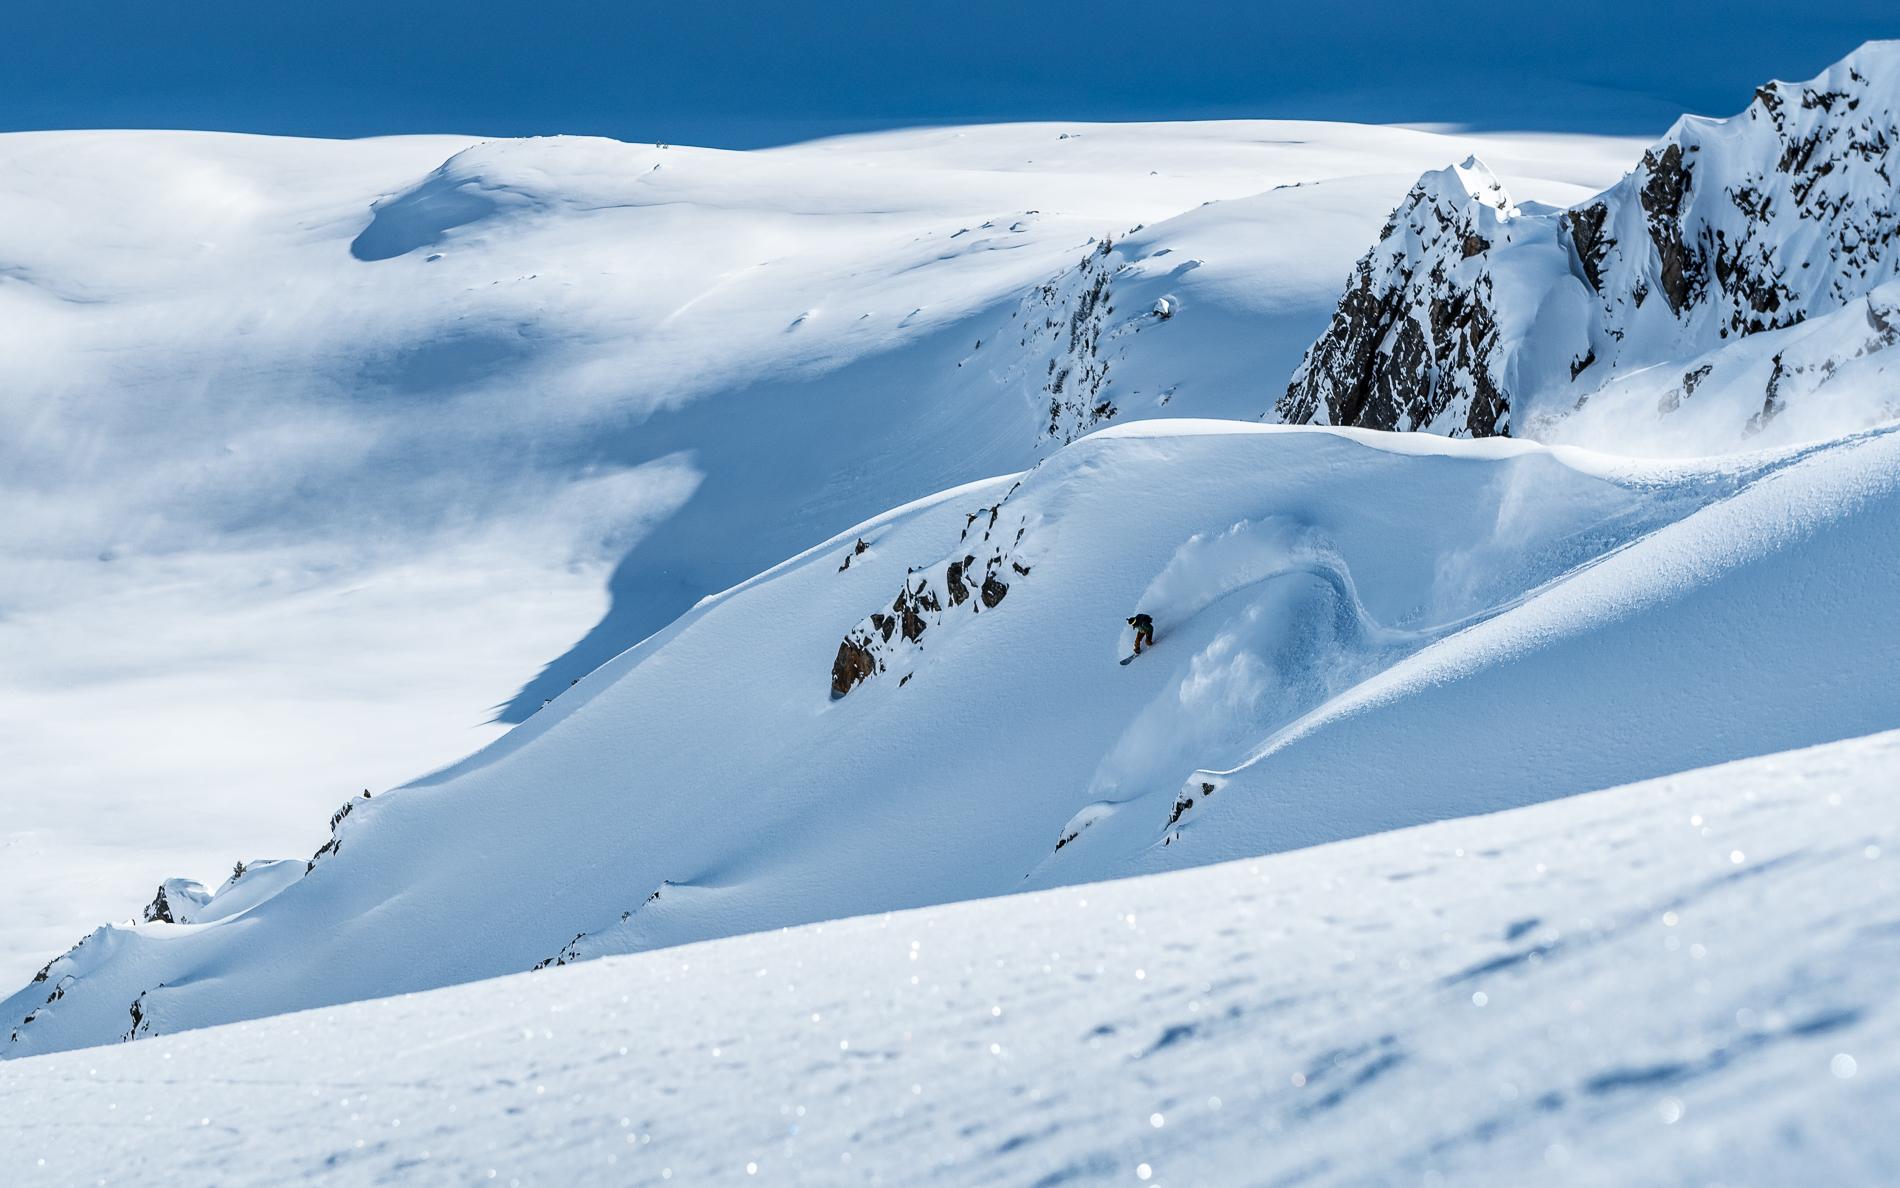 Mattia Vicentini in Tirol, Austria. Photo: Chris Riefenberg